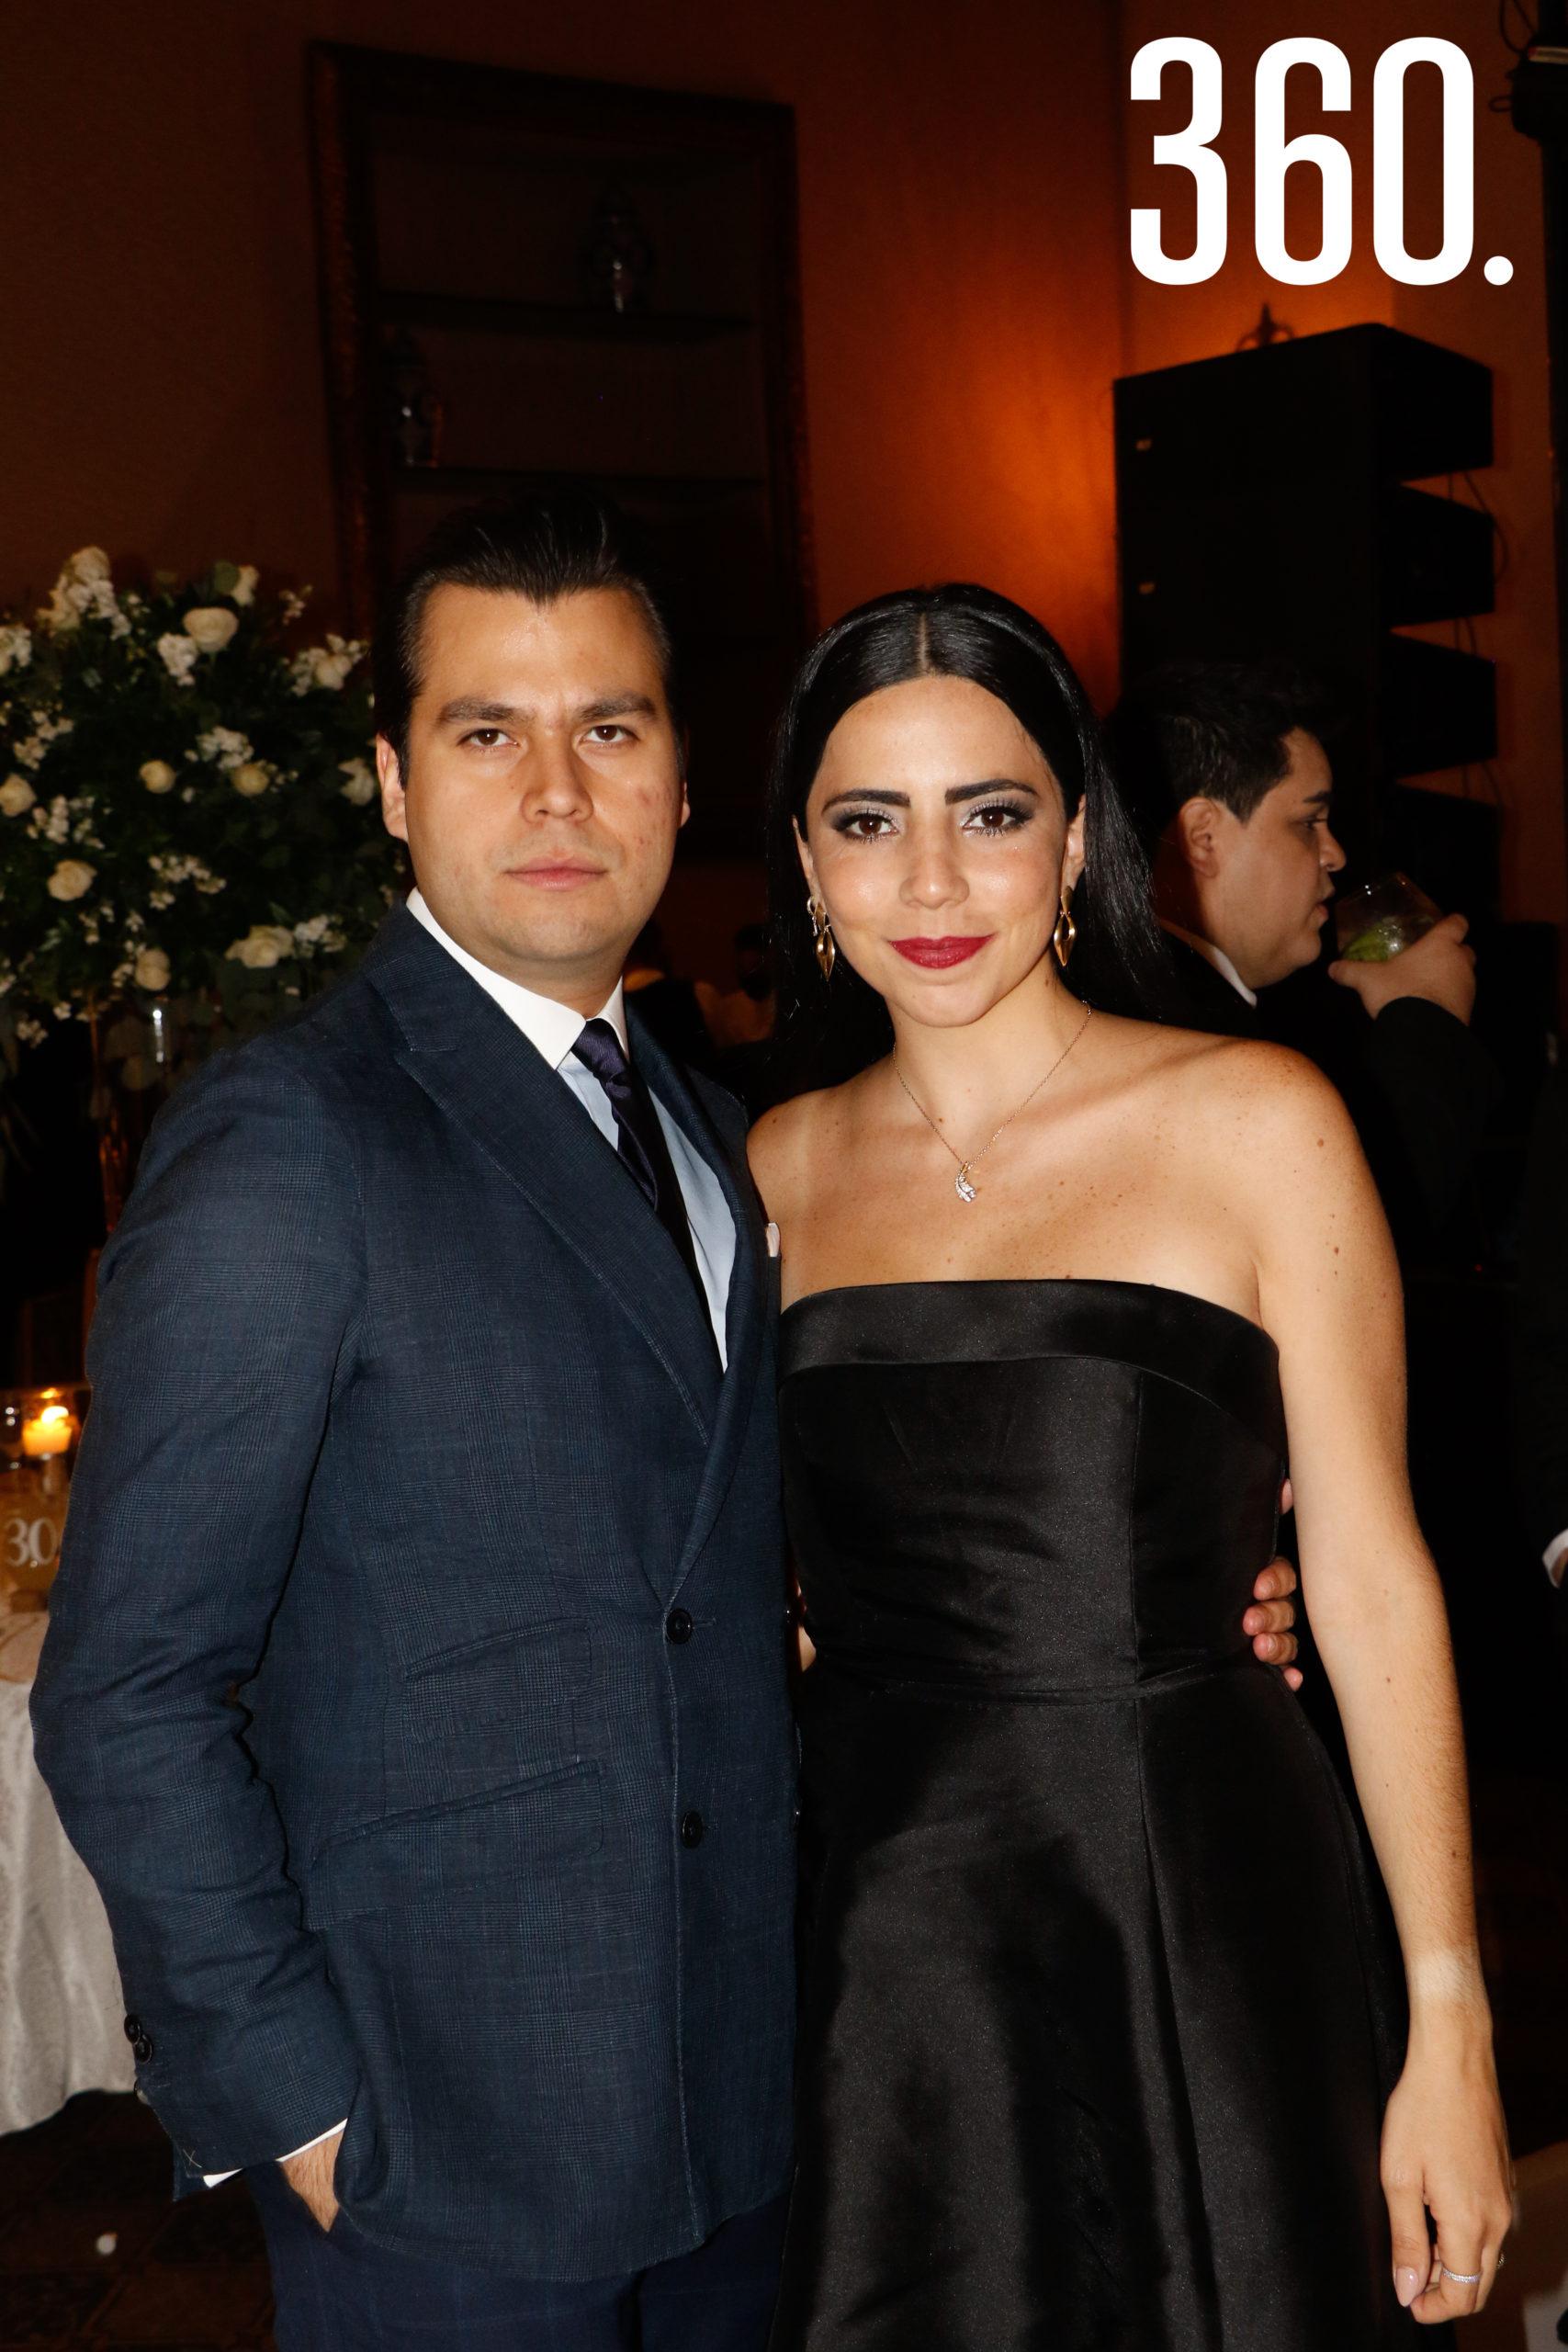 Rodrigo Carbajal y Julieta Elizondo.